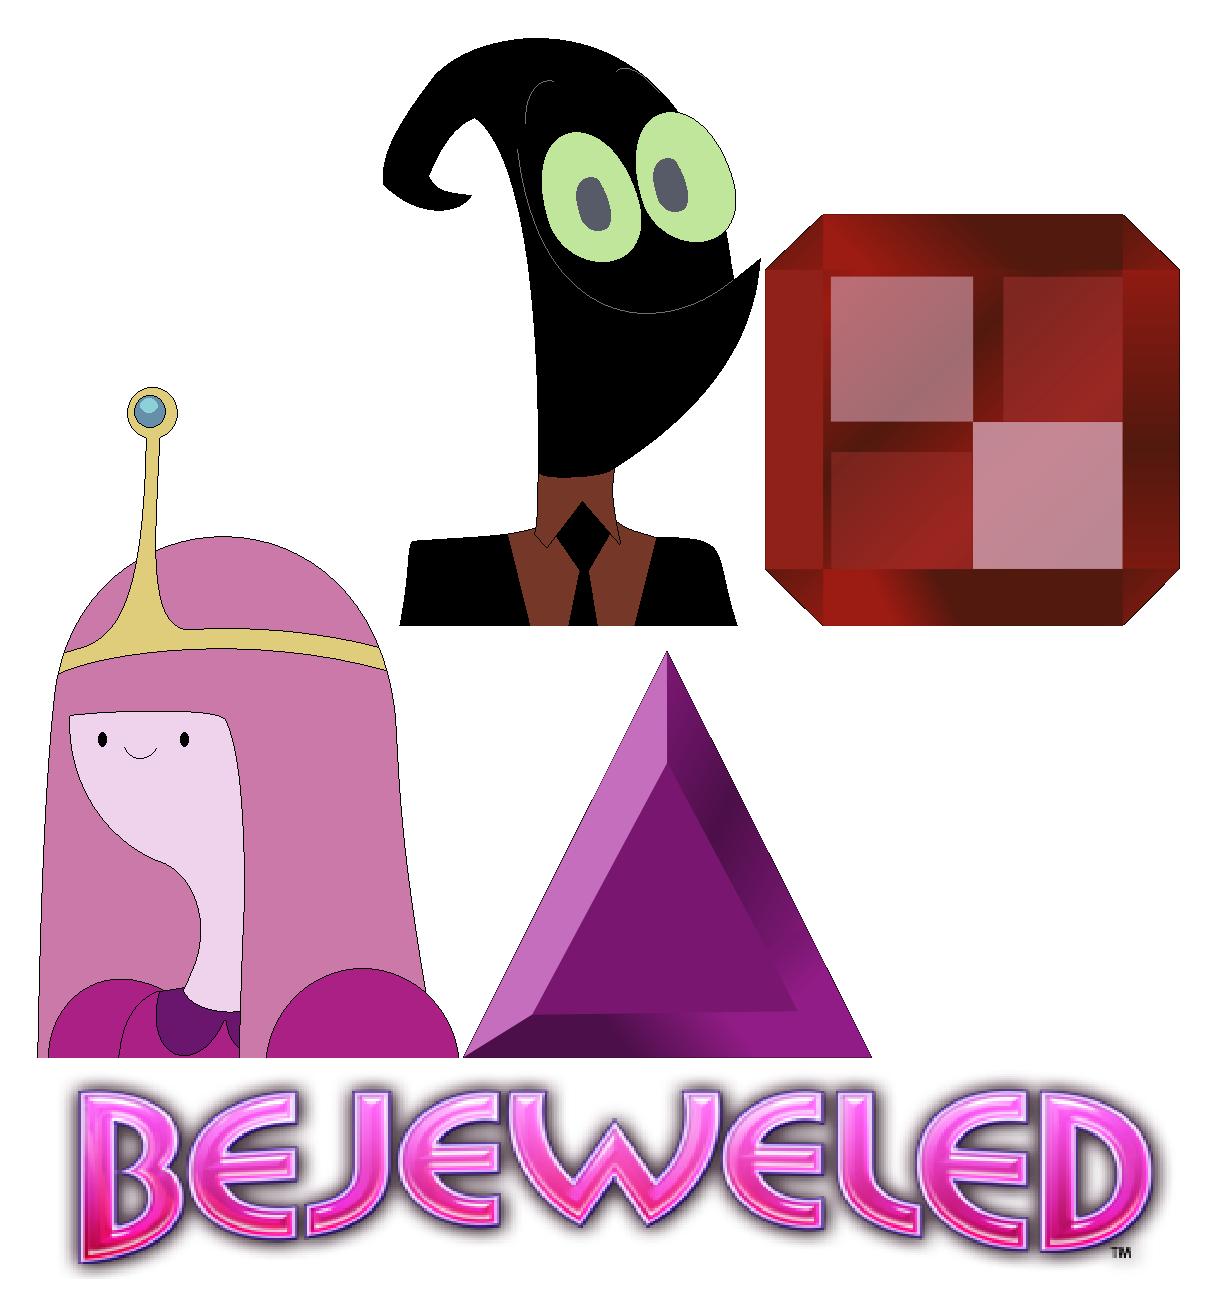 Nergal And Princess Bubblegum In Bejeweled PopCap Game Cartoon Network 2016 :)